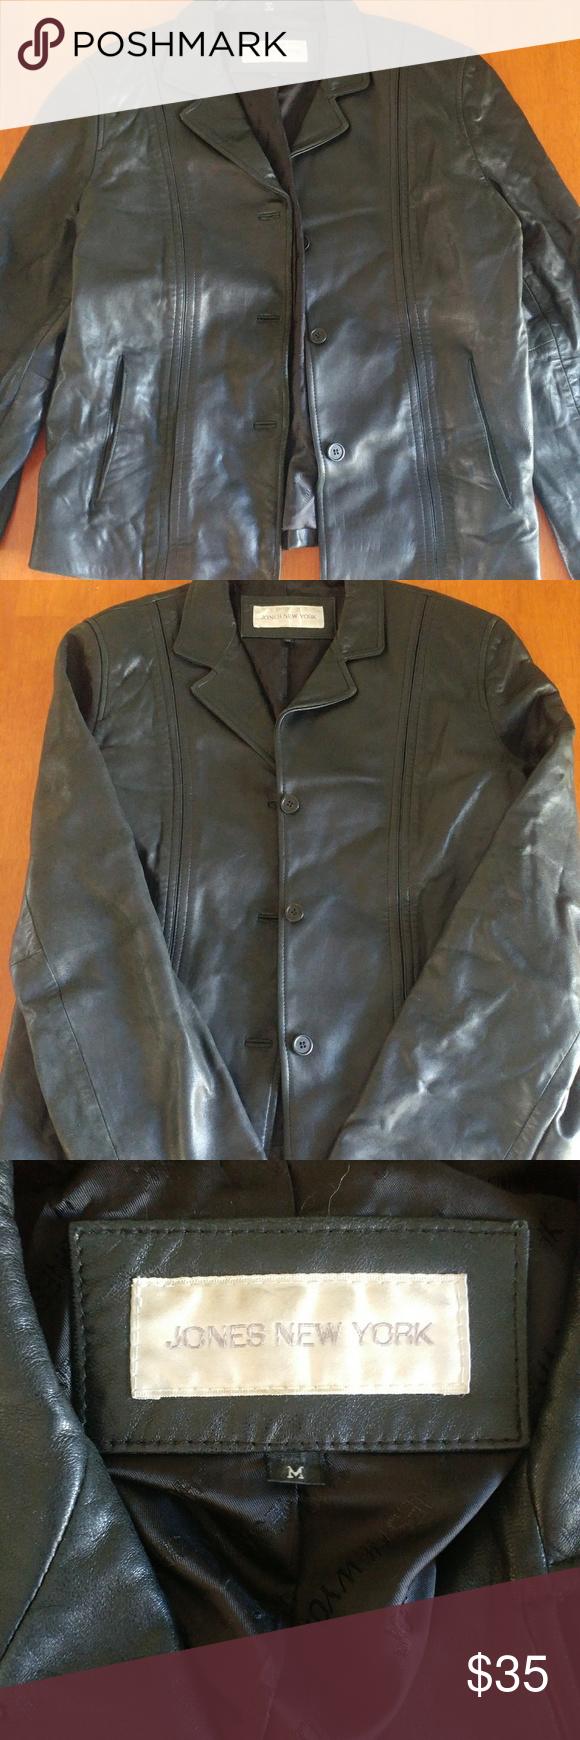 Jones New York Leather Jacket Jones New York Leather Jacket Leather Jackets Women [ 1740 x 580 Pixel ]